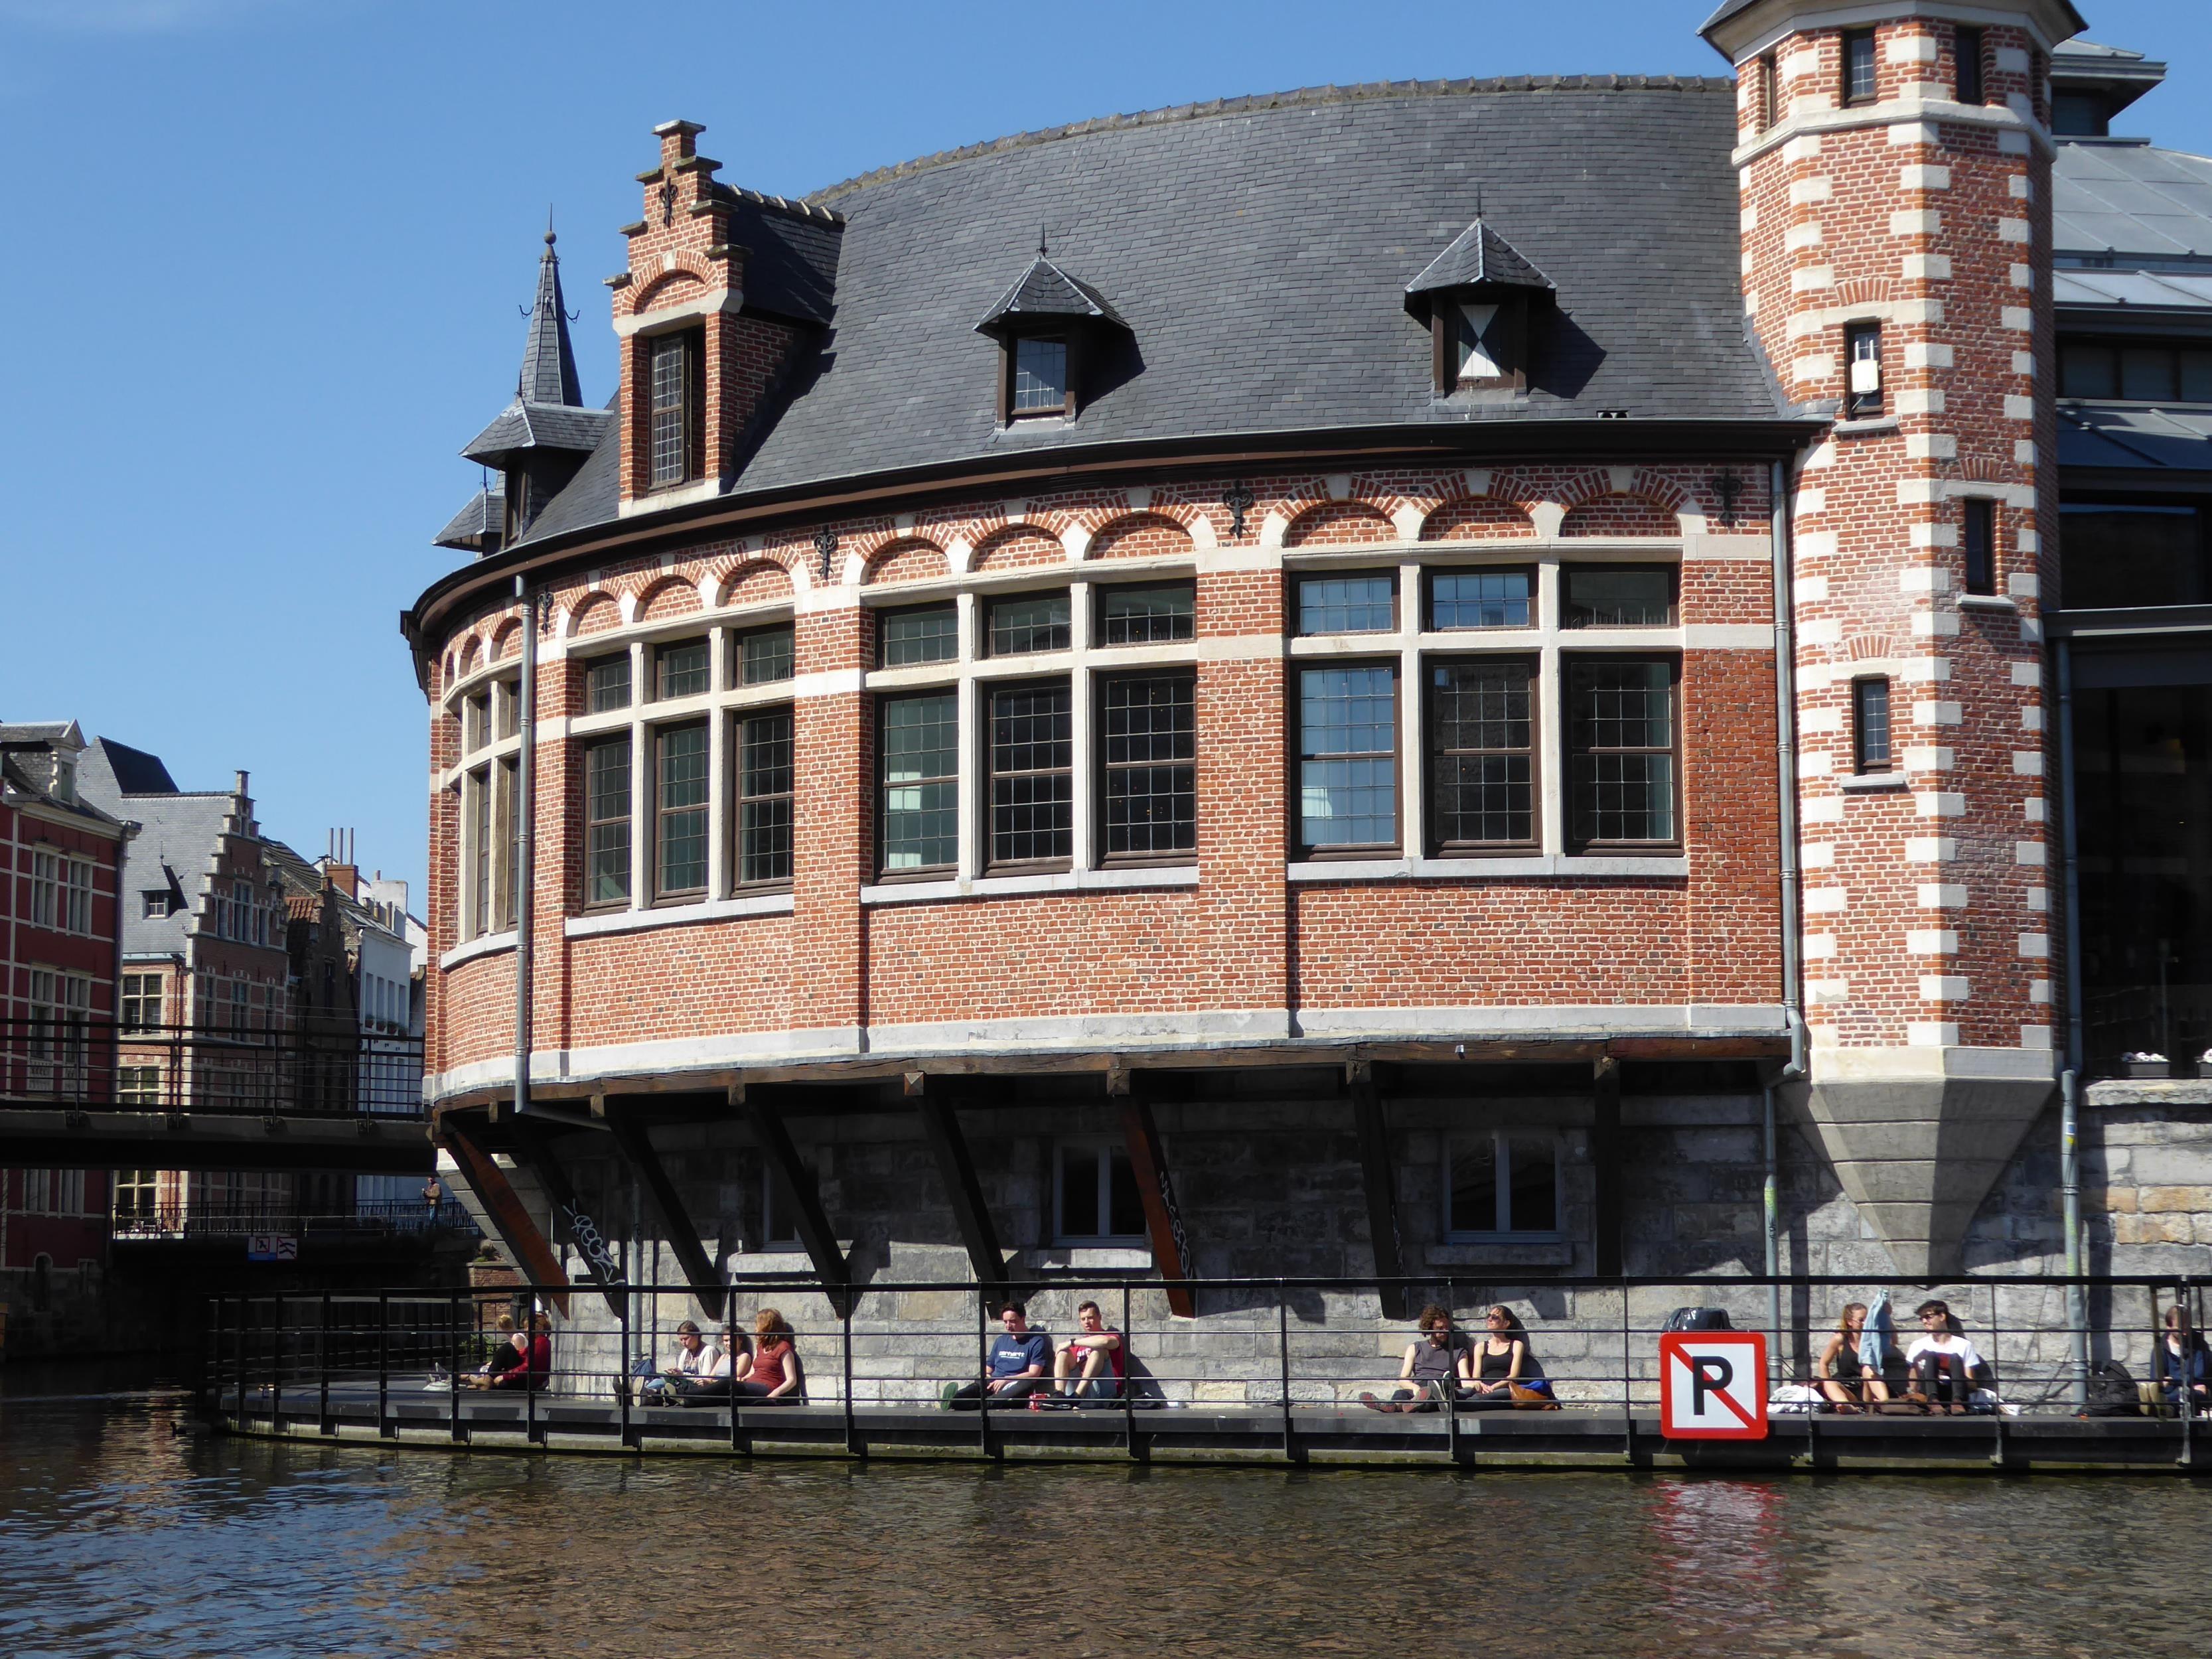 The Oude Vismijn